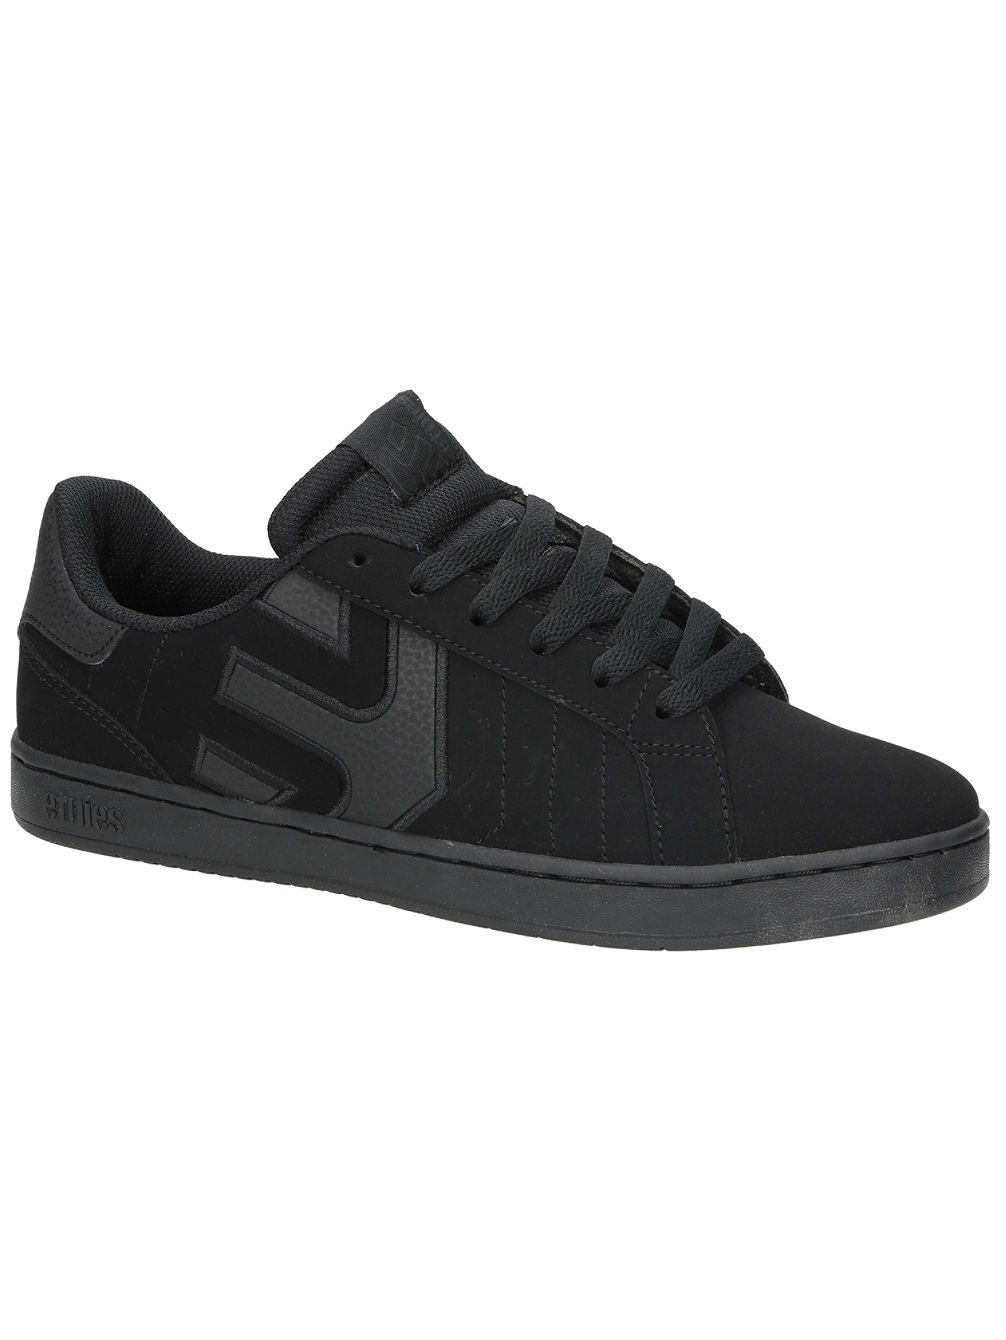 etnies-fader-ls-sneakers